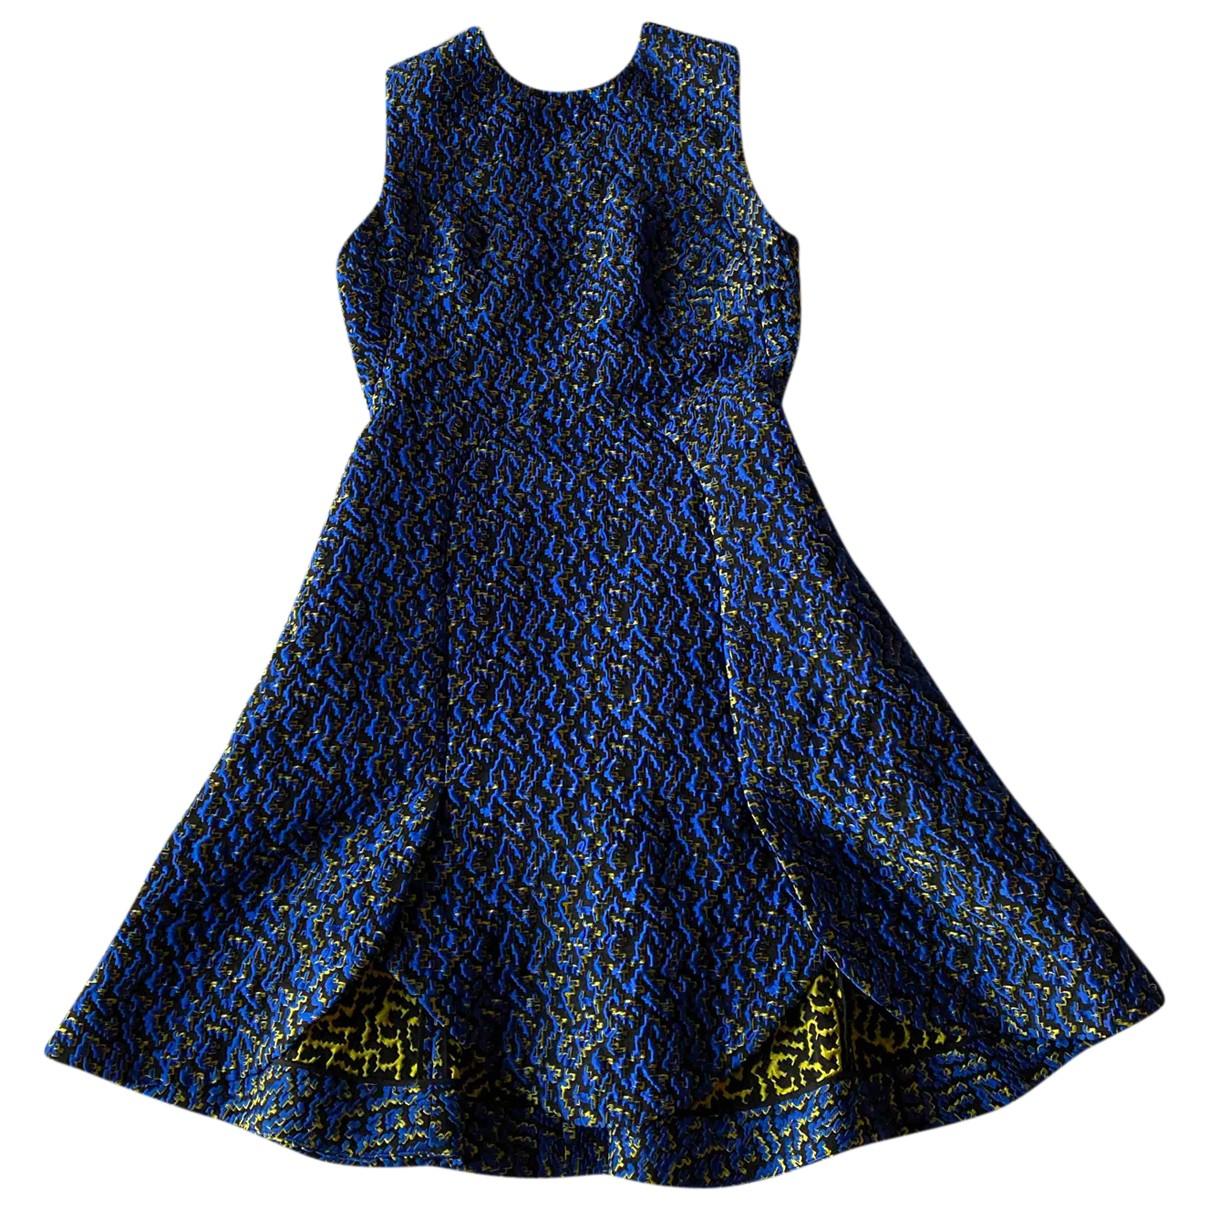 Antonio Berardi \N Blue dress for Women 40 IT